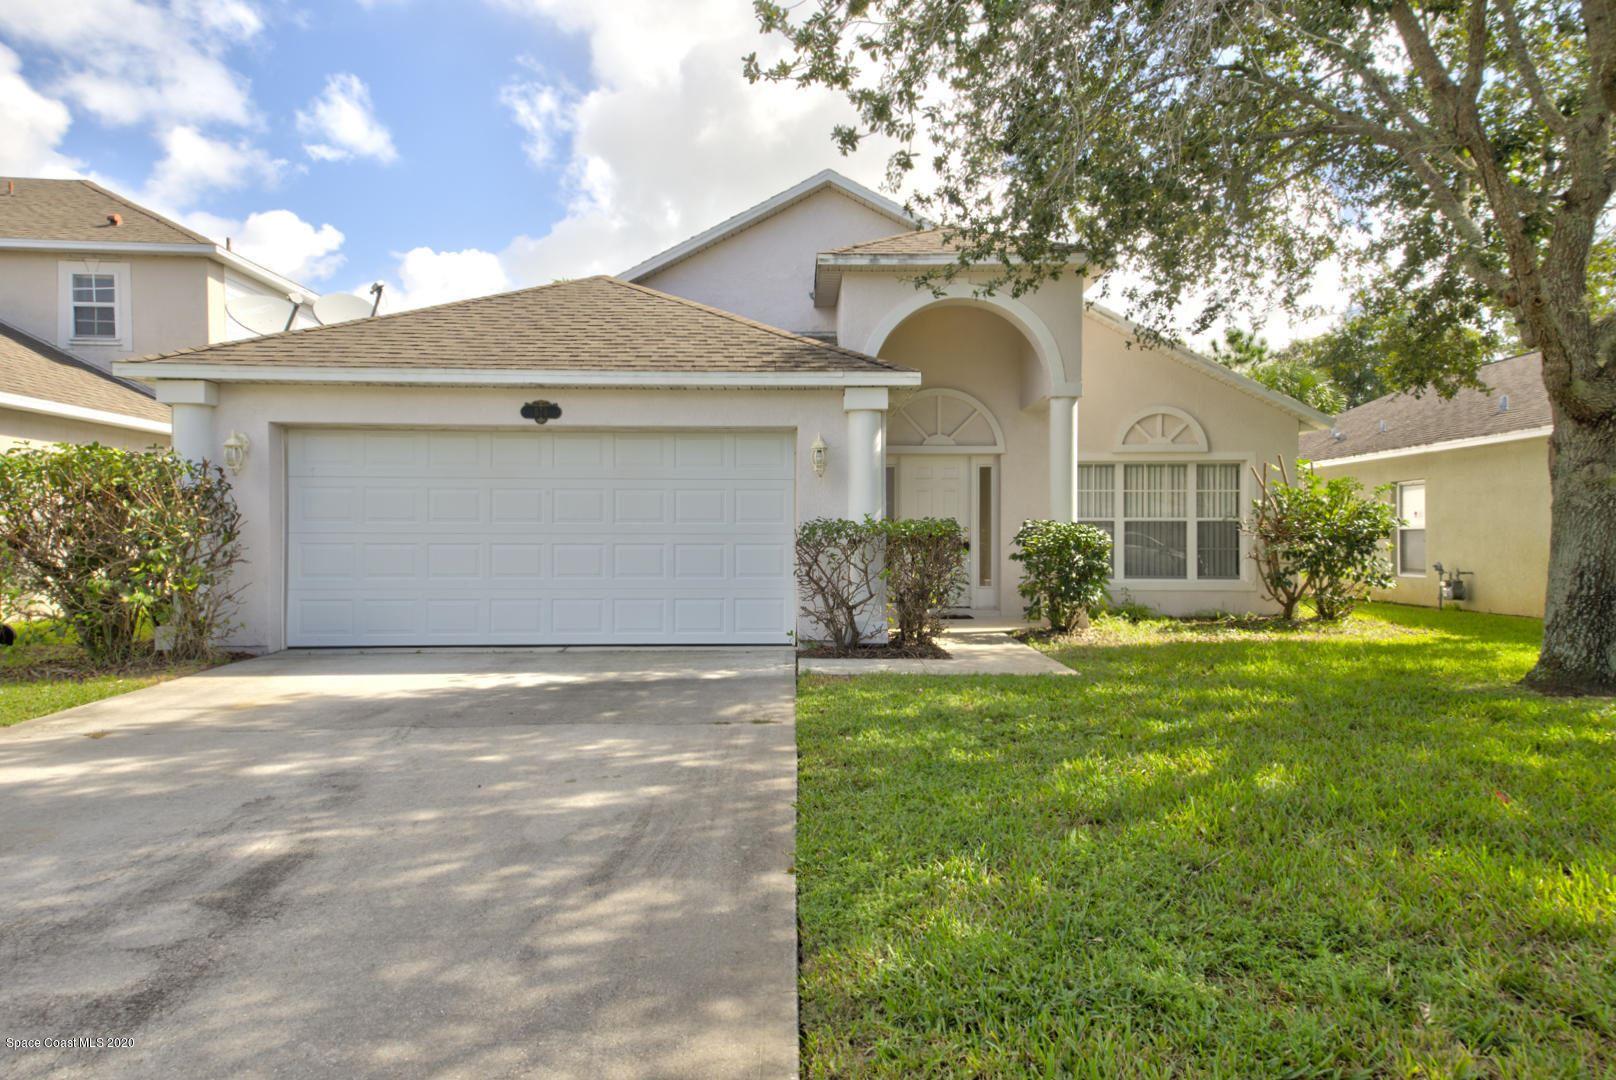 579 Macon Drive, Titusville, FL 32780 - #: 888506